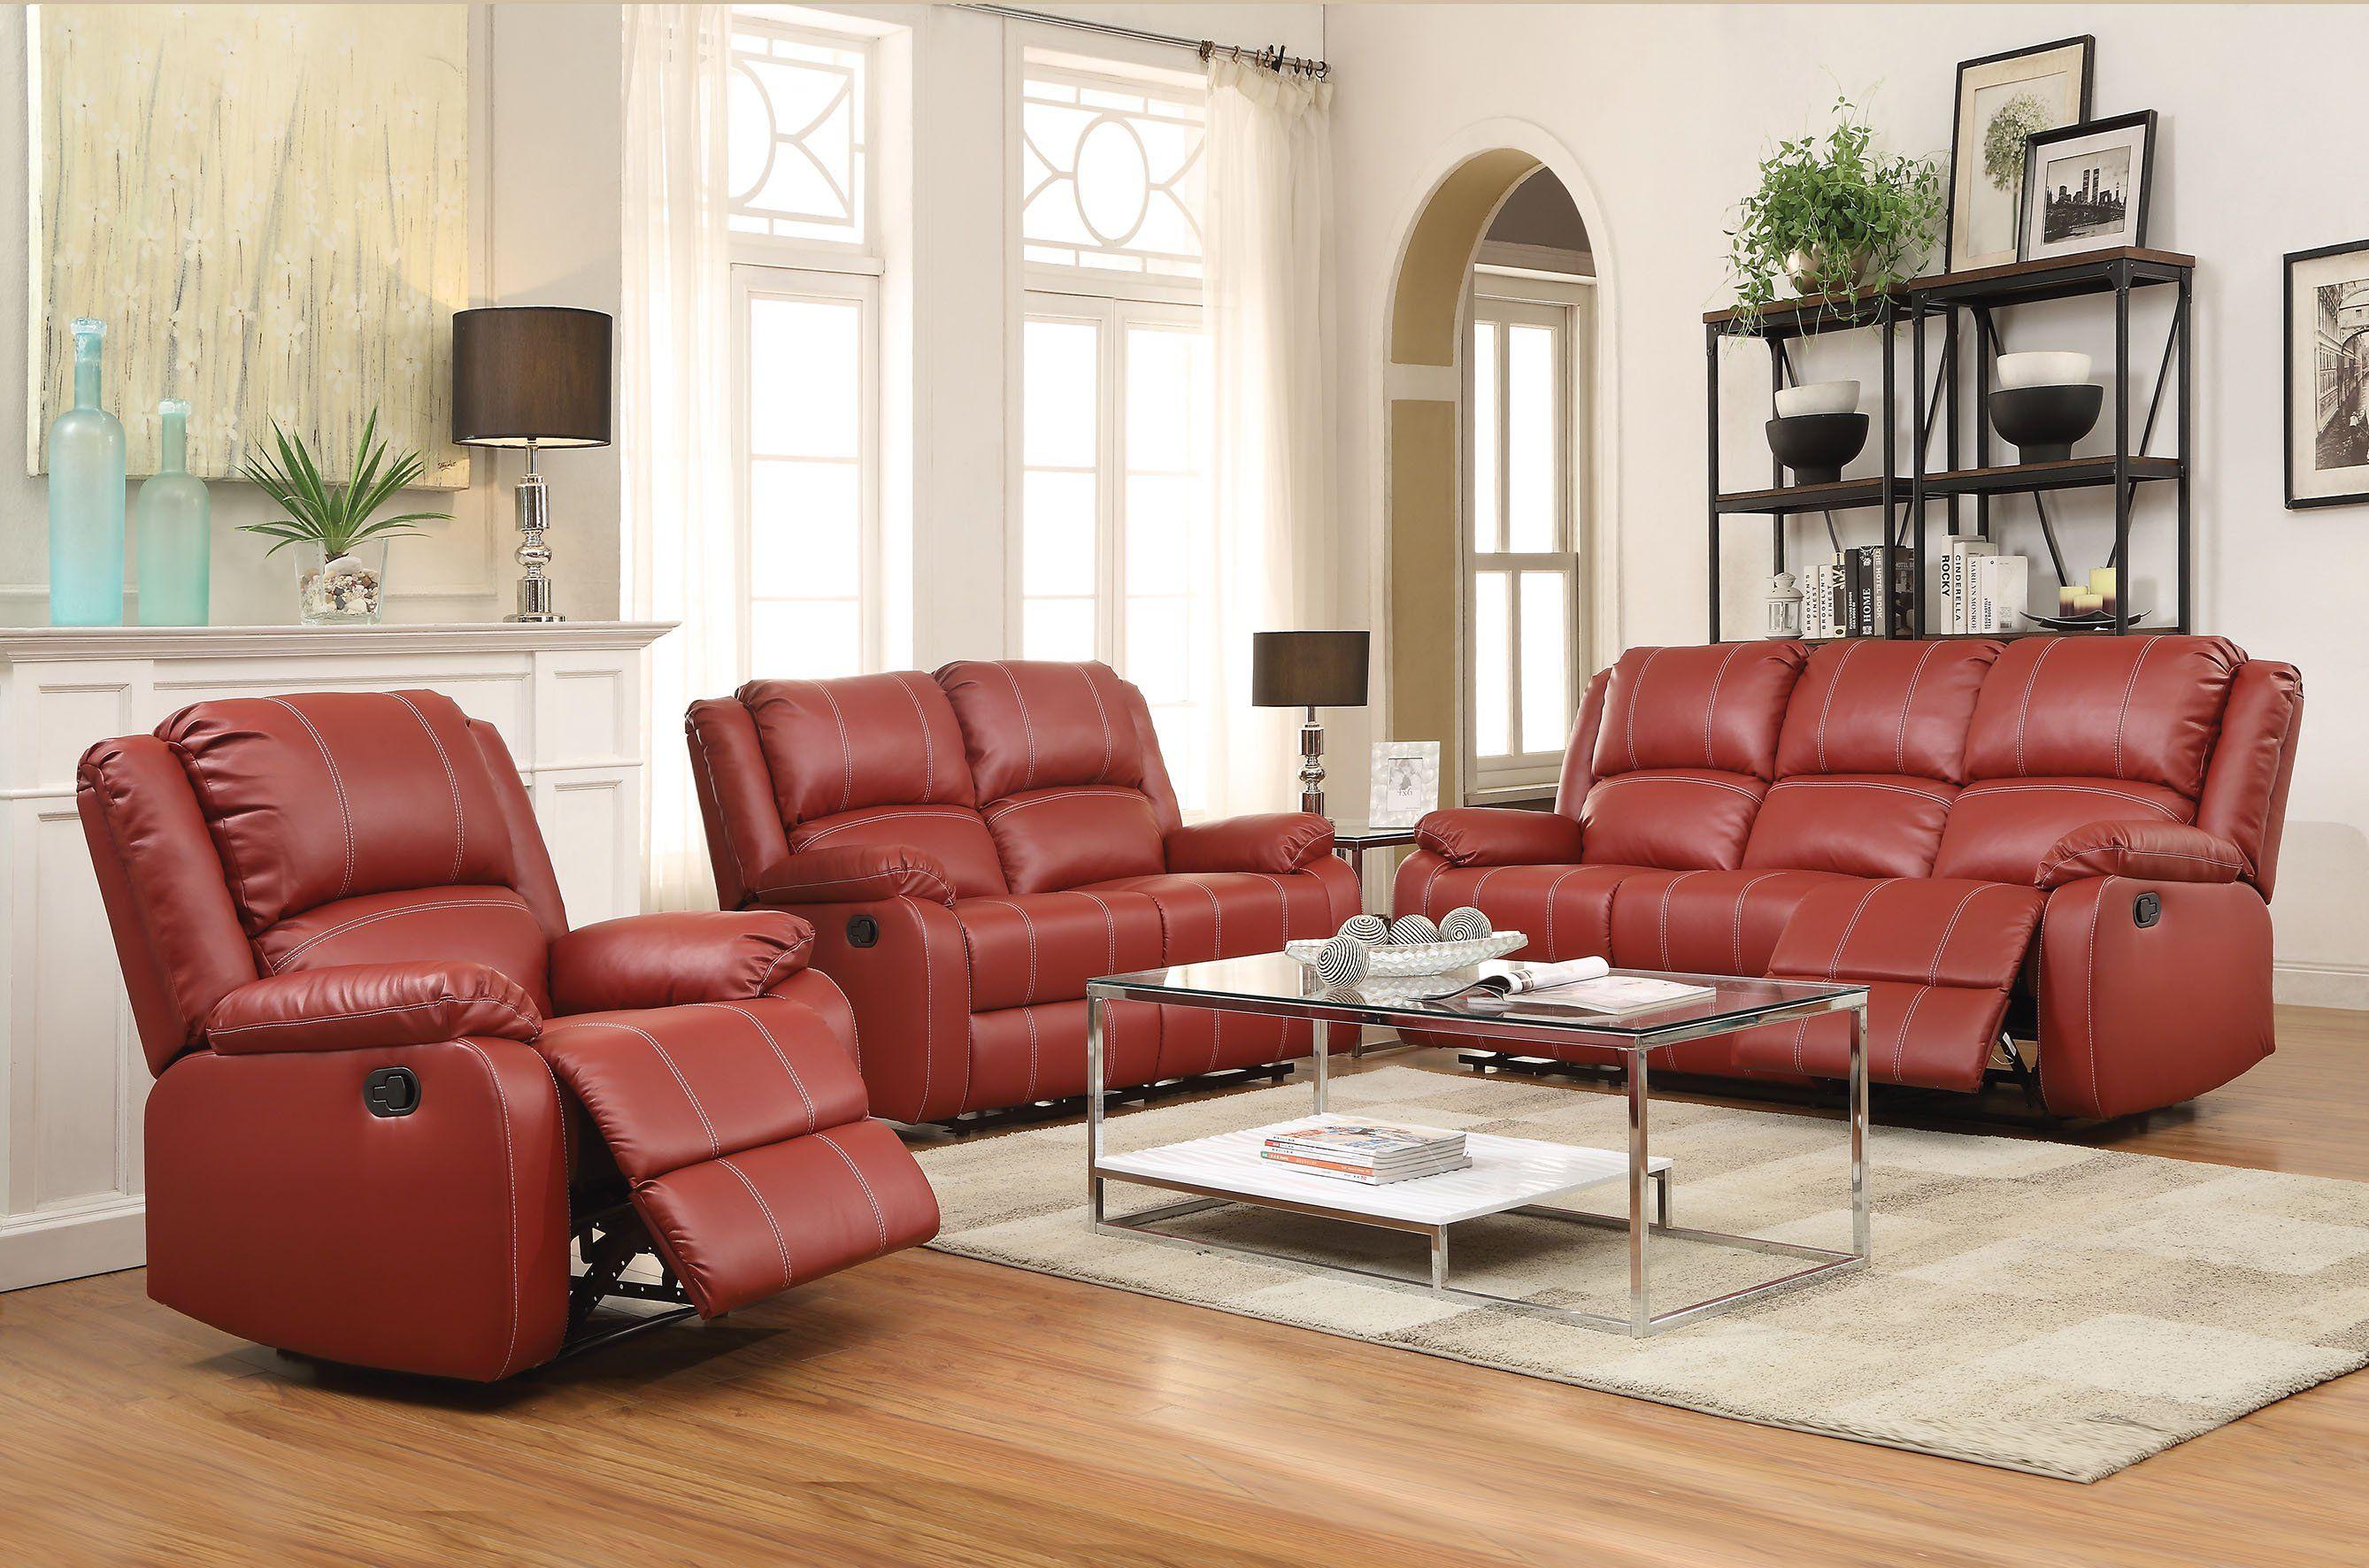 Best Acme Zuriel Red Pu Leather Reclining Sofa Set In 2019 400 x 300